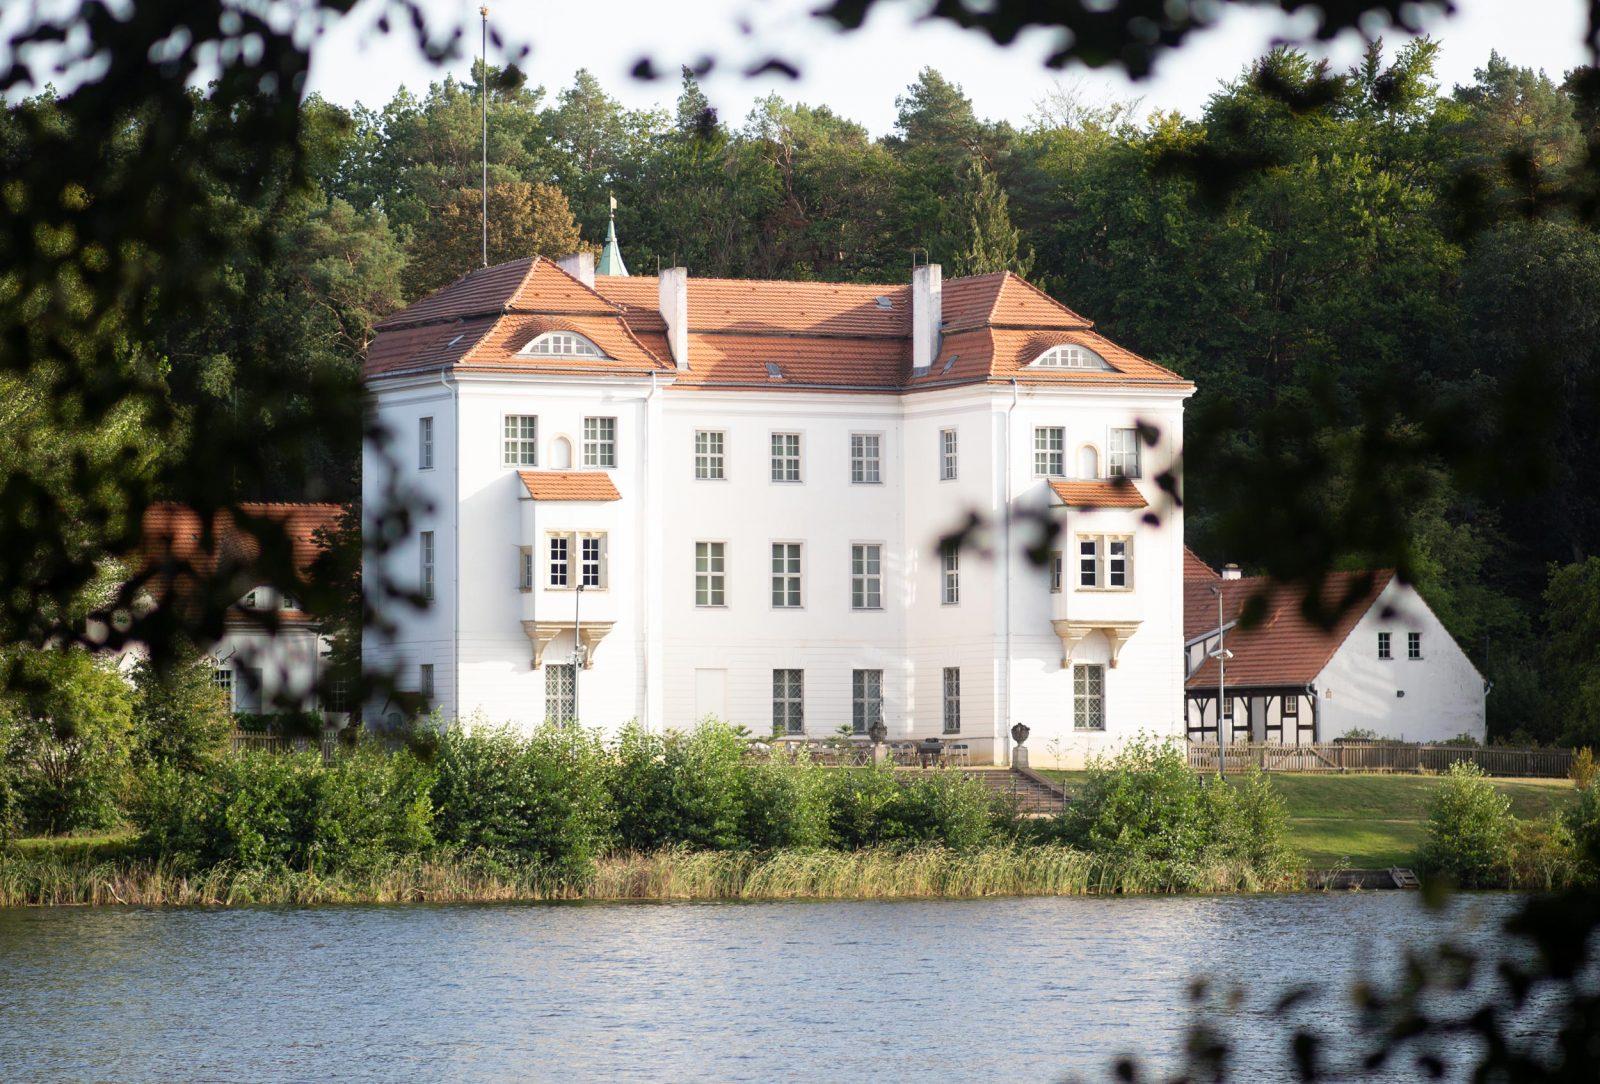 Das Jagschloss Grunewald beherbergt eine Gemäldesammlung